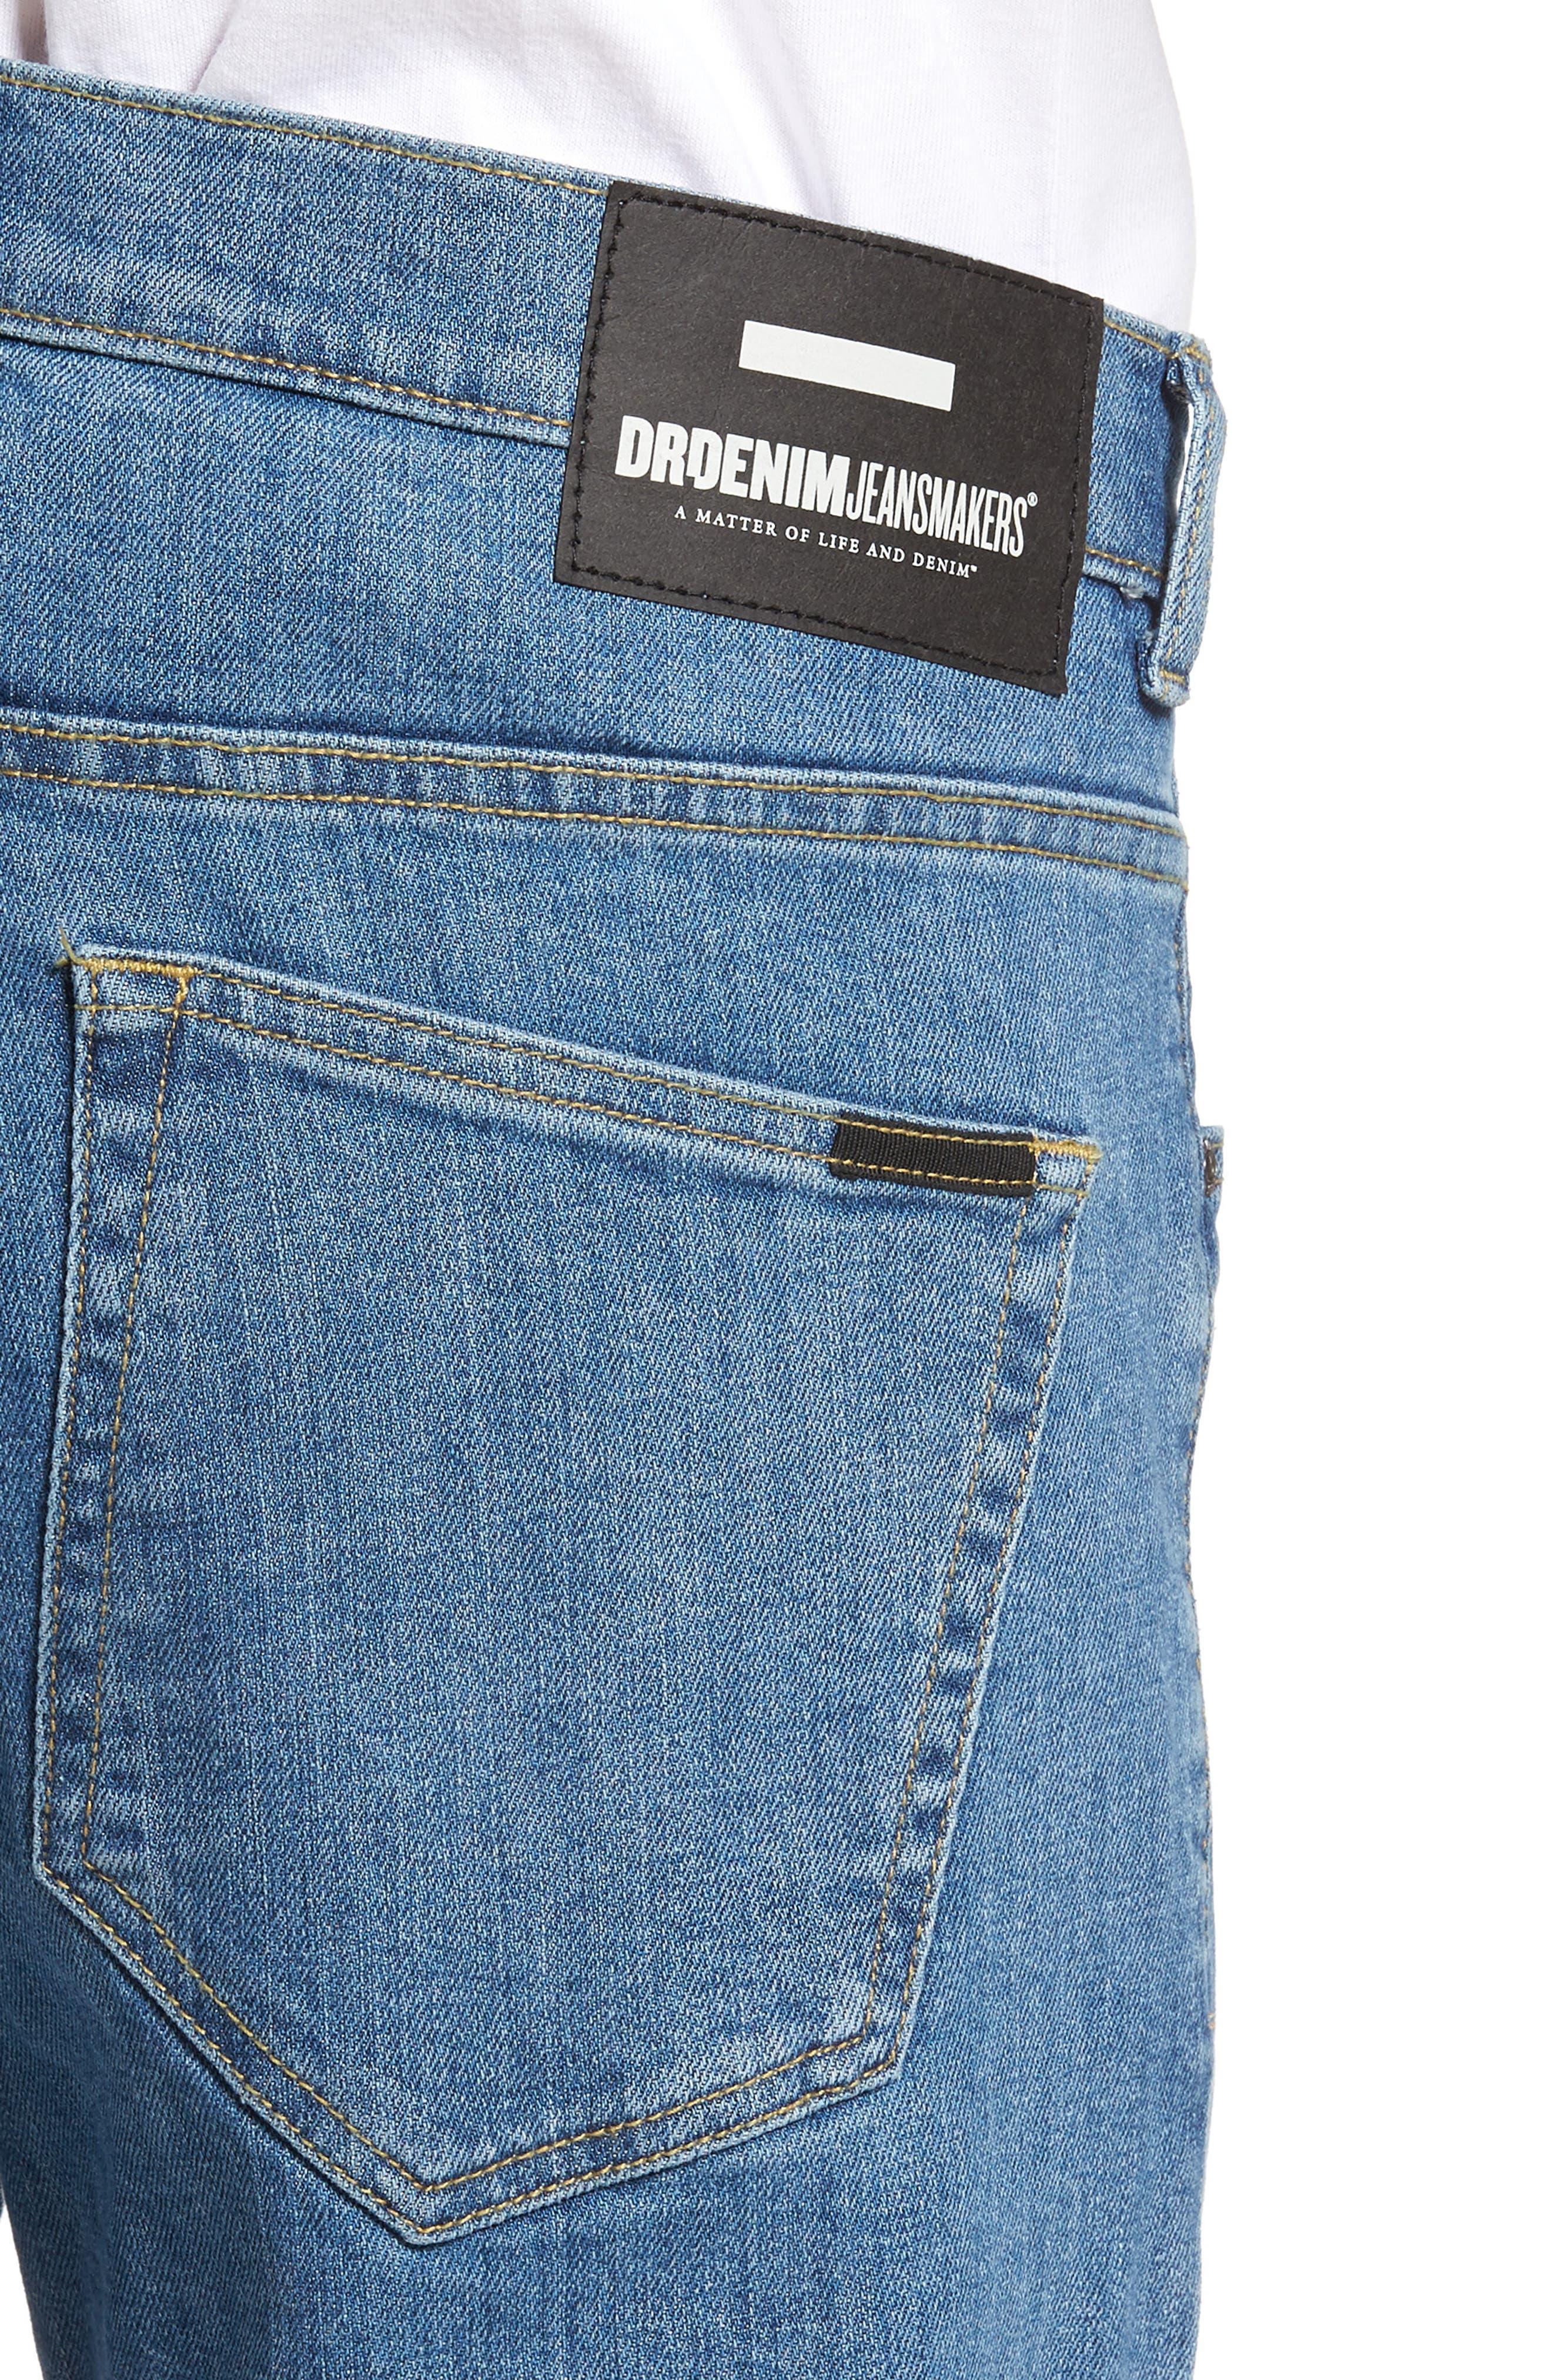 Clark Slim Straight Fit Jeans,                             Alternate thumbnail 4, color,